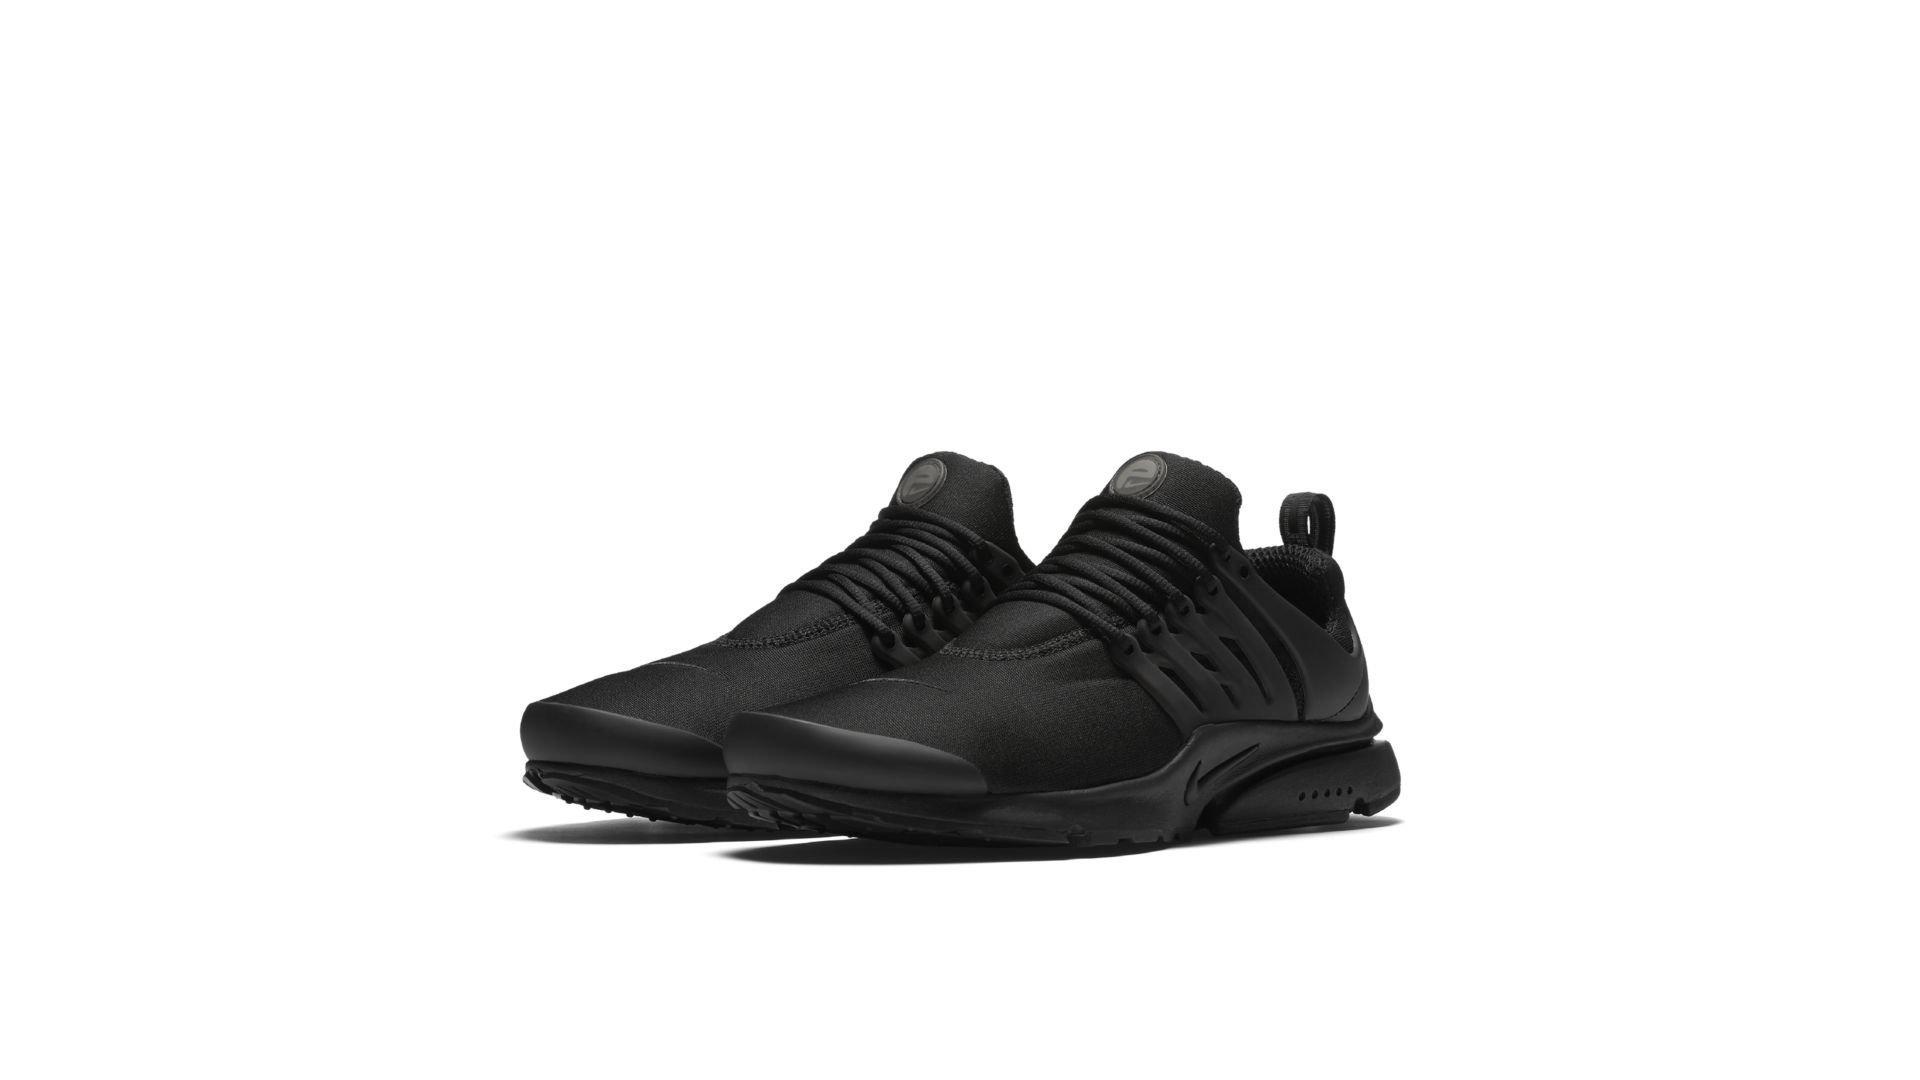 Nike Air Presto Essential Triple Black (848187-011)